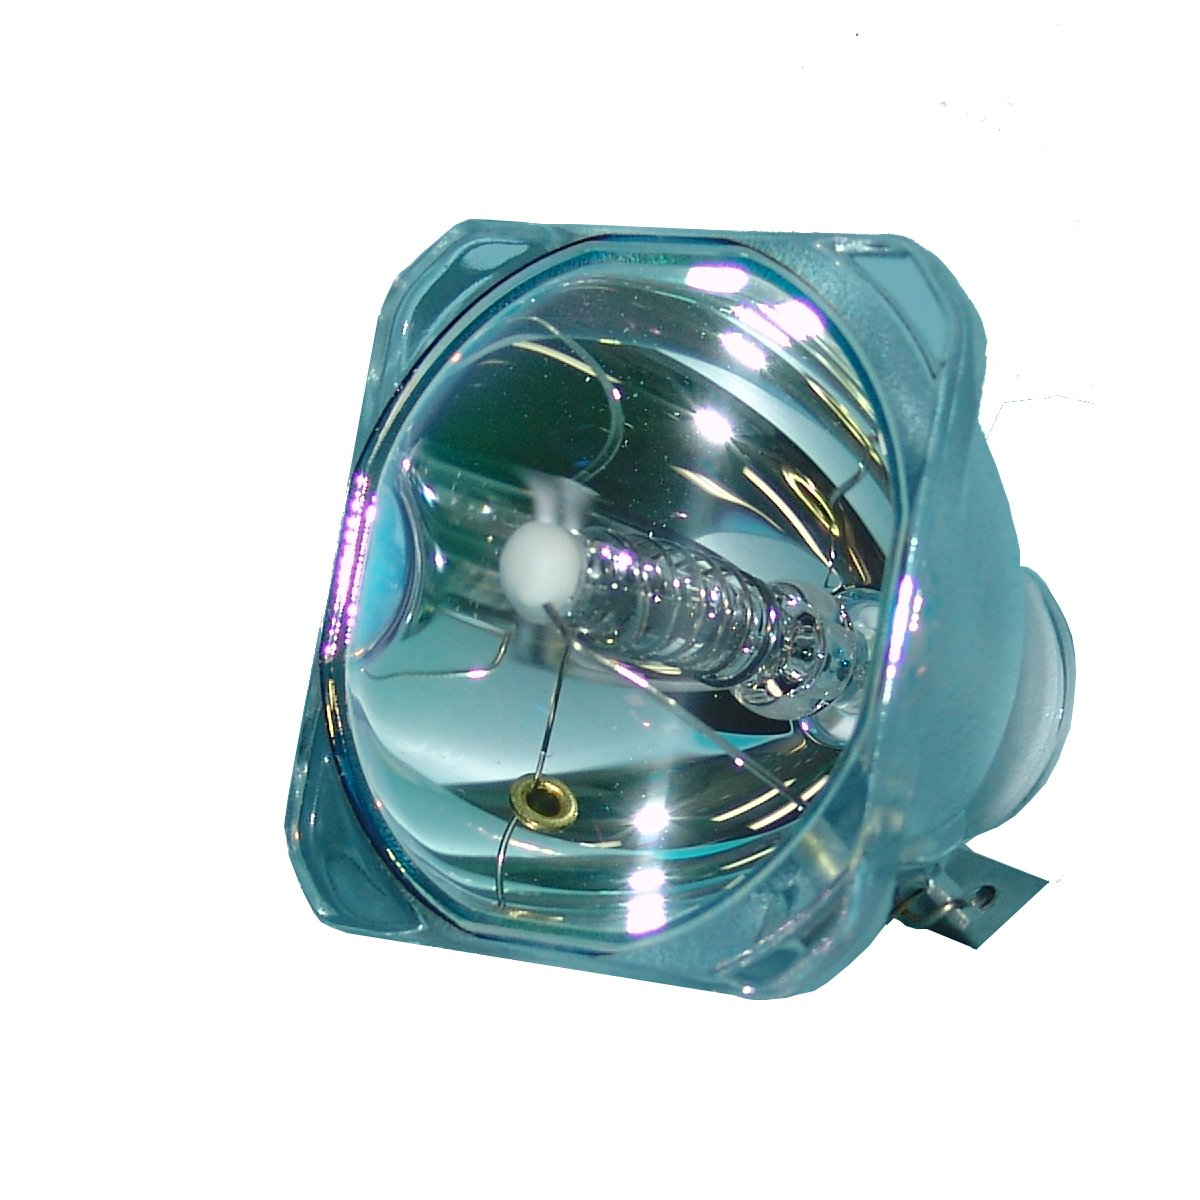 Lutema OEMプロジェクター交換用ランプ ハウジング/電球付き デジタルプロジェクション用 IVision 30-1080P-W(C) Economy B07KTLQ2P2 Lamp Only Economy